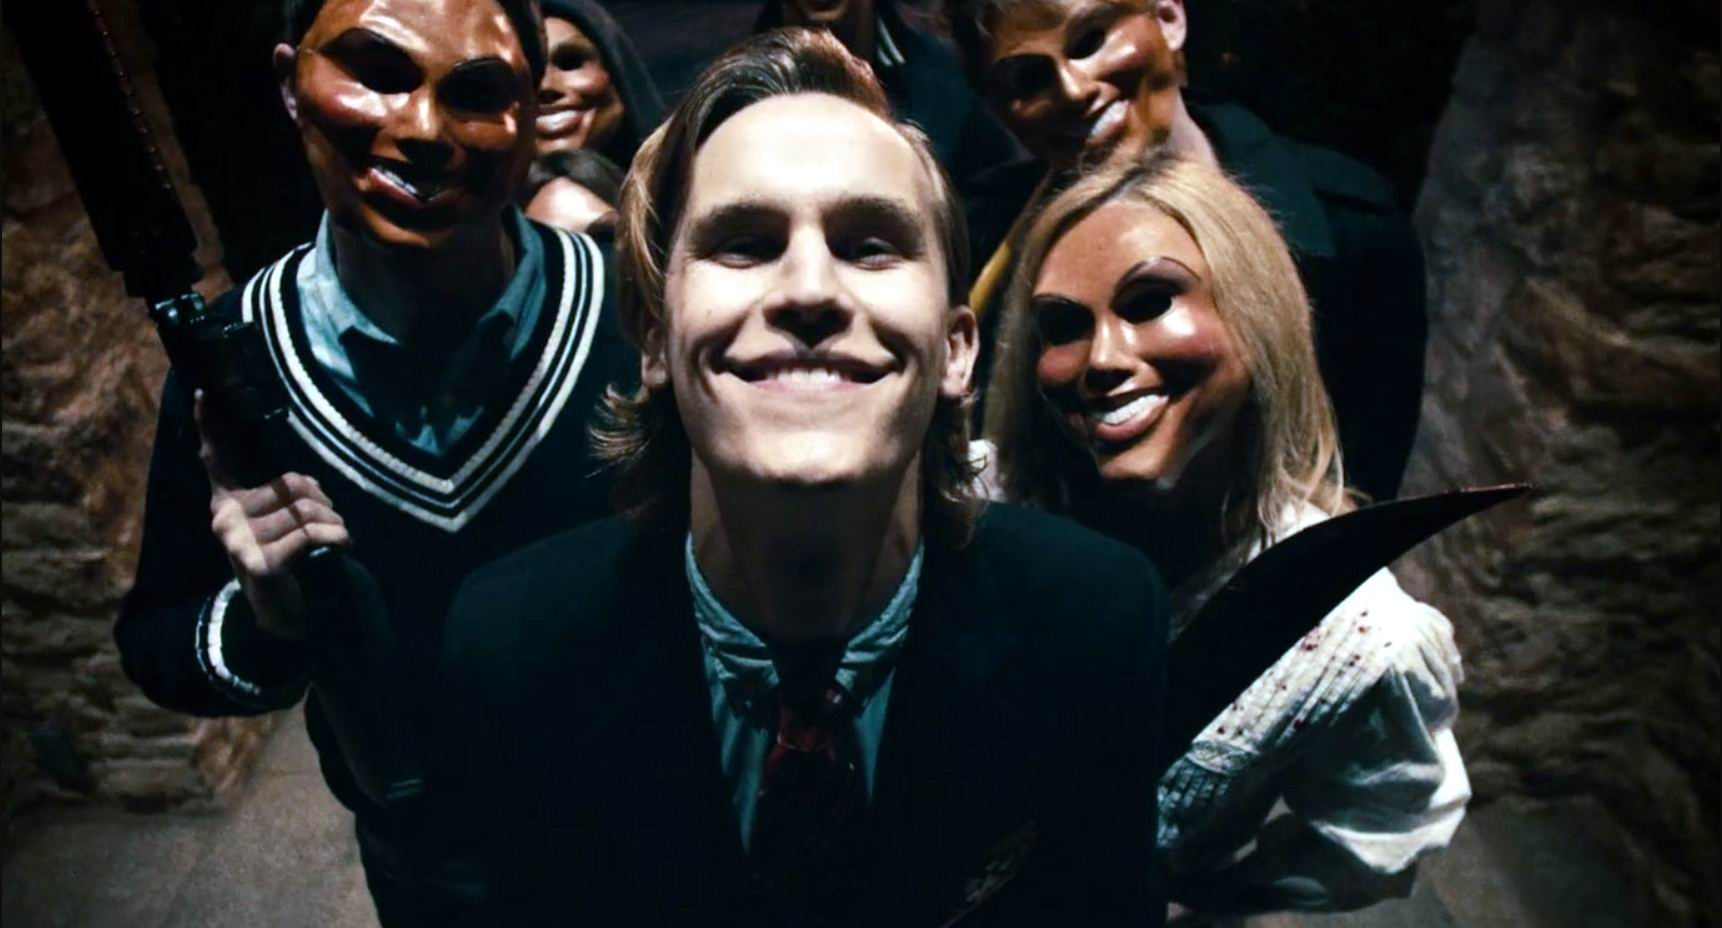 Судная ночь / The Purge (2013): кадр из фильма